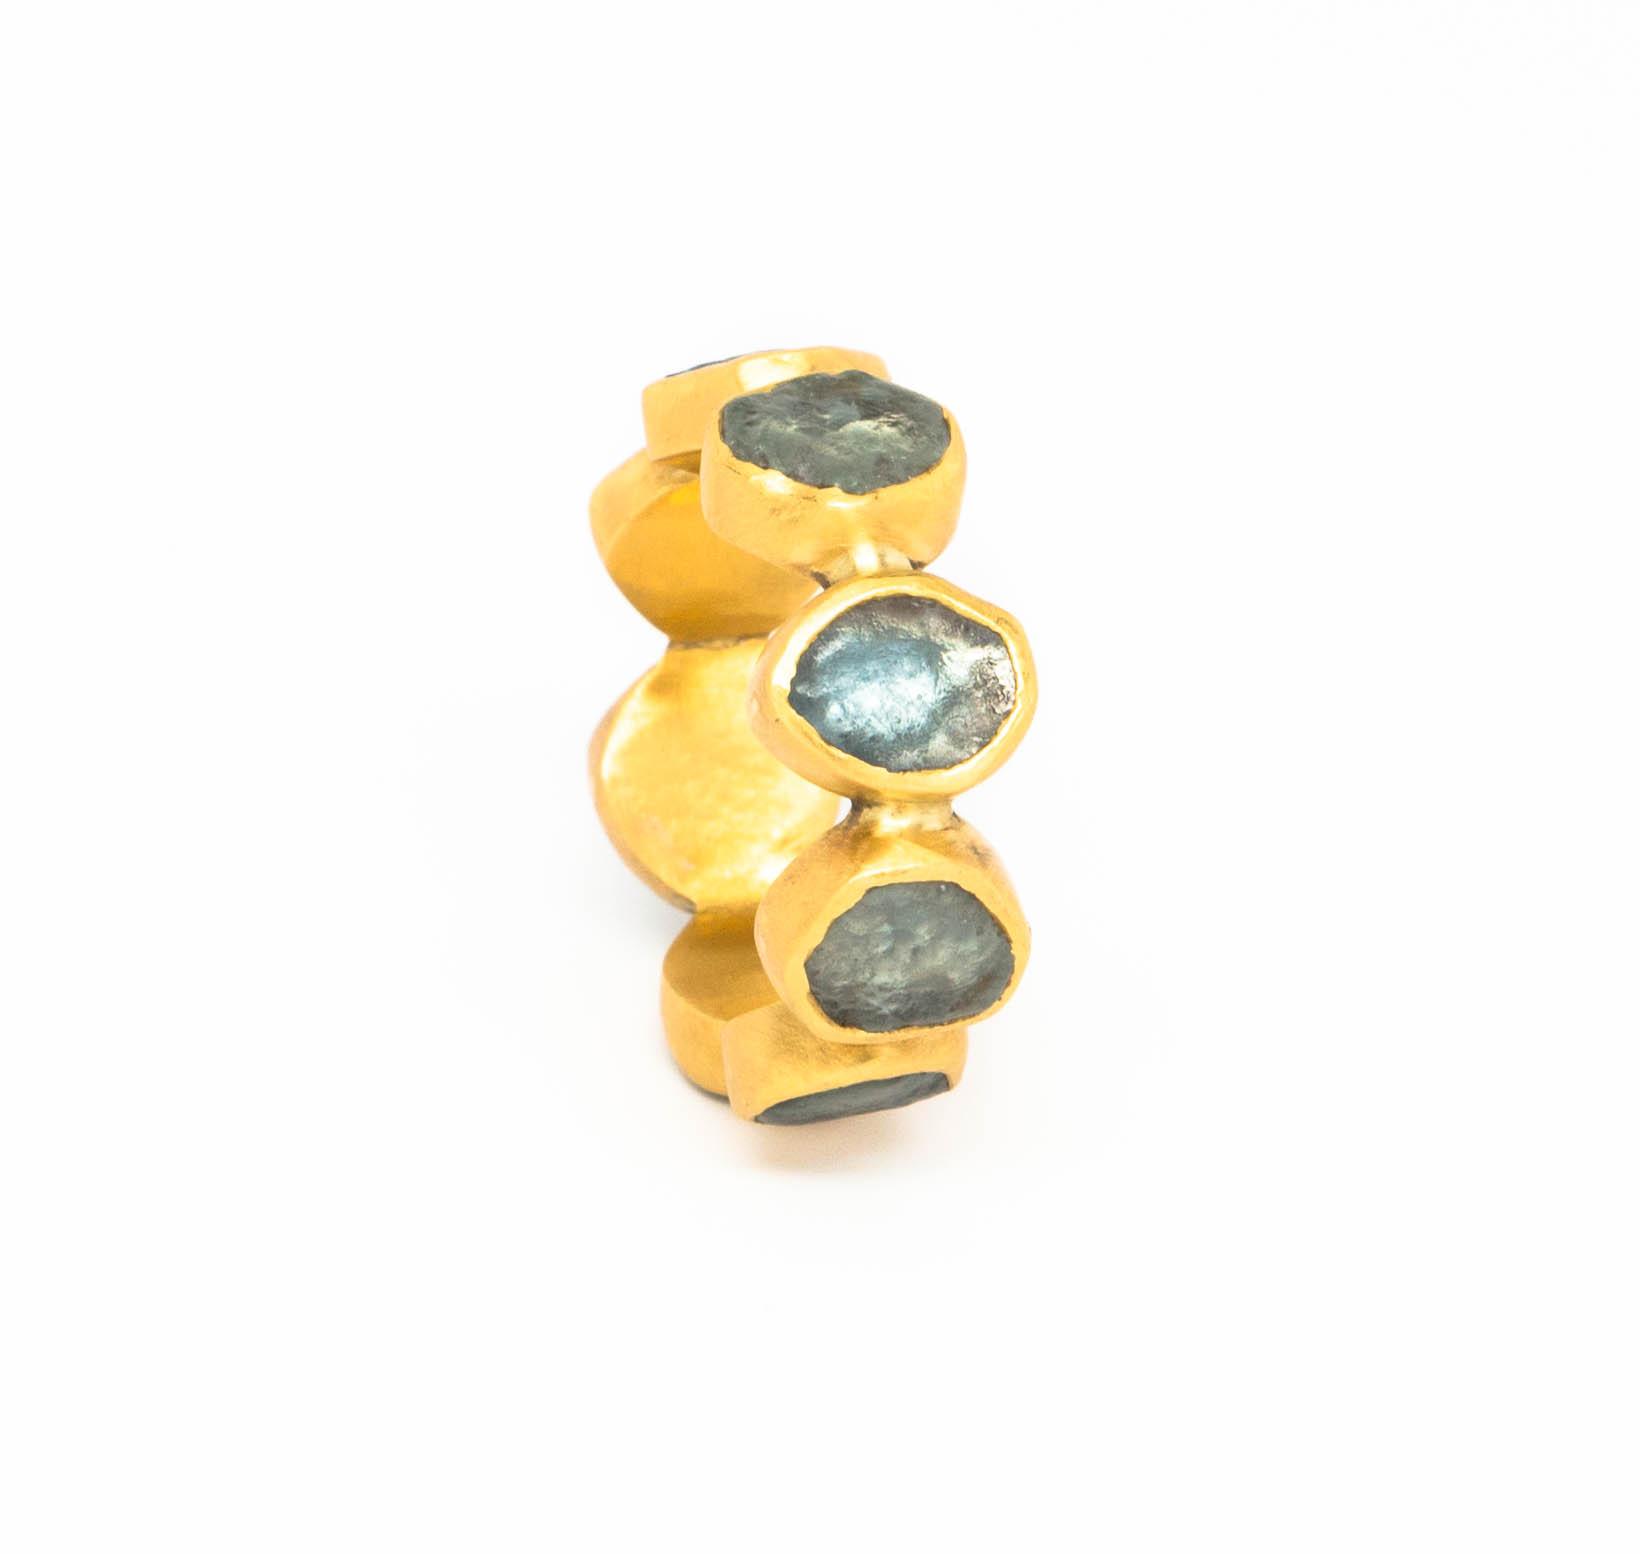 dec21 jewelry5-651.jpg